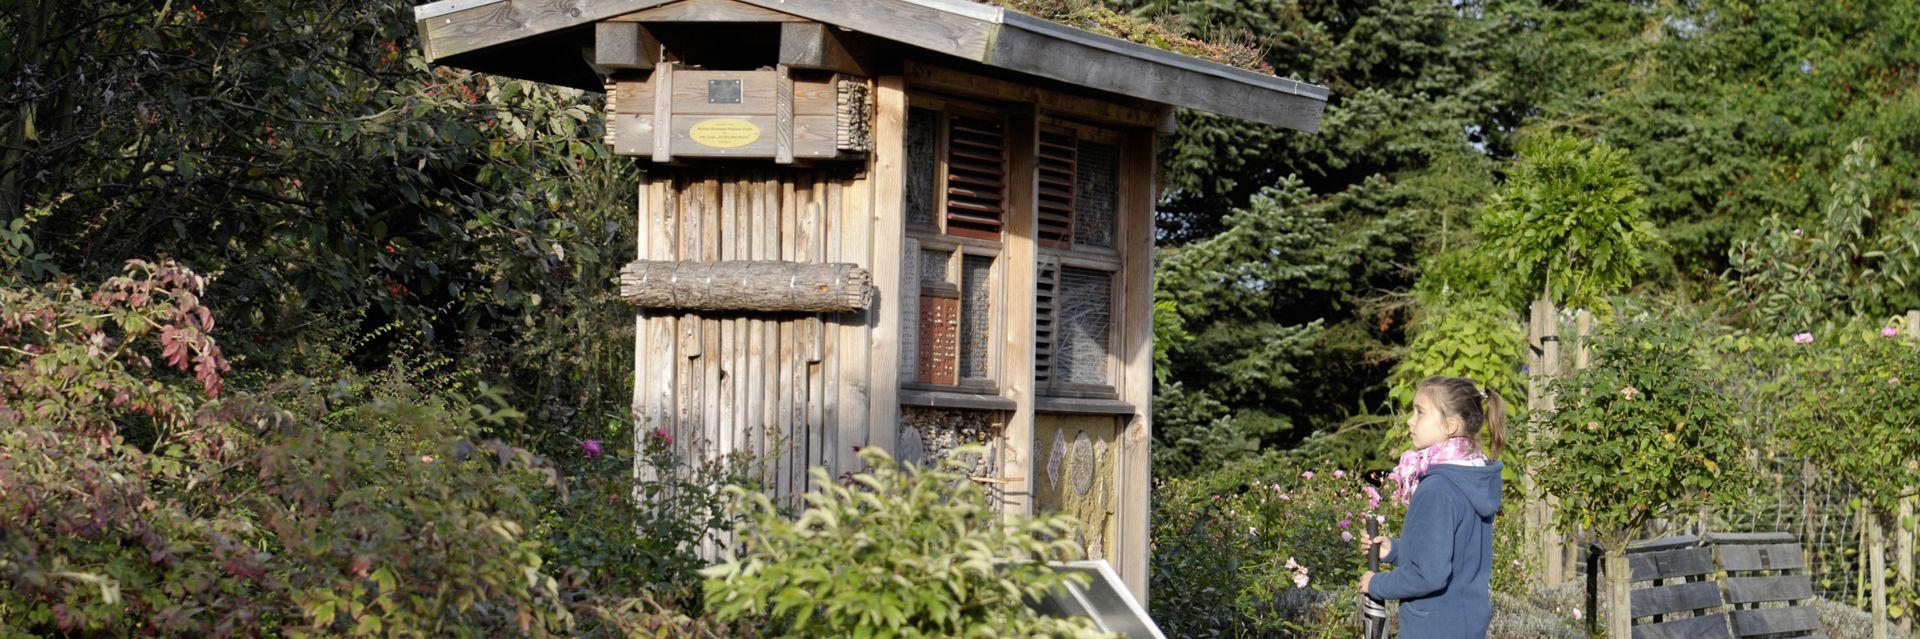 Norddeutsche Gartenschau im Arboretum Ellerhoop